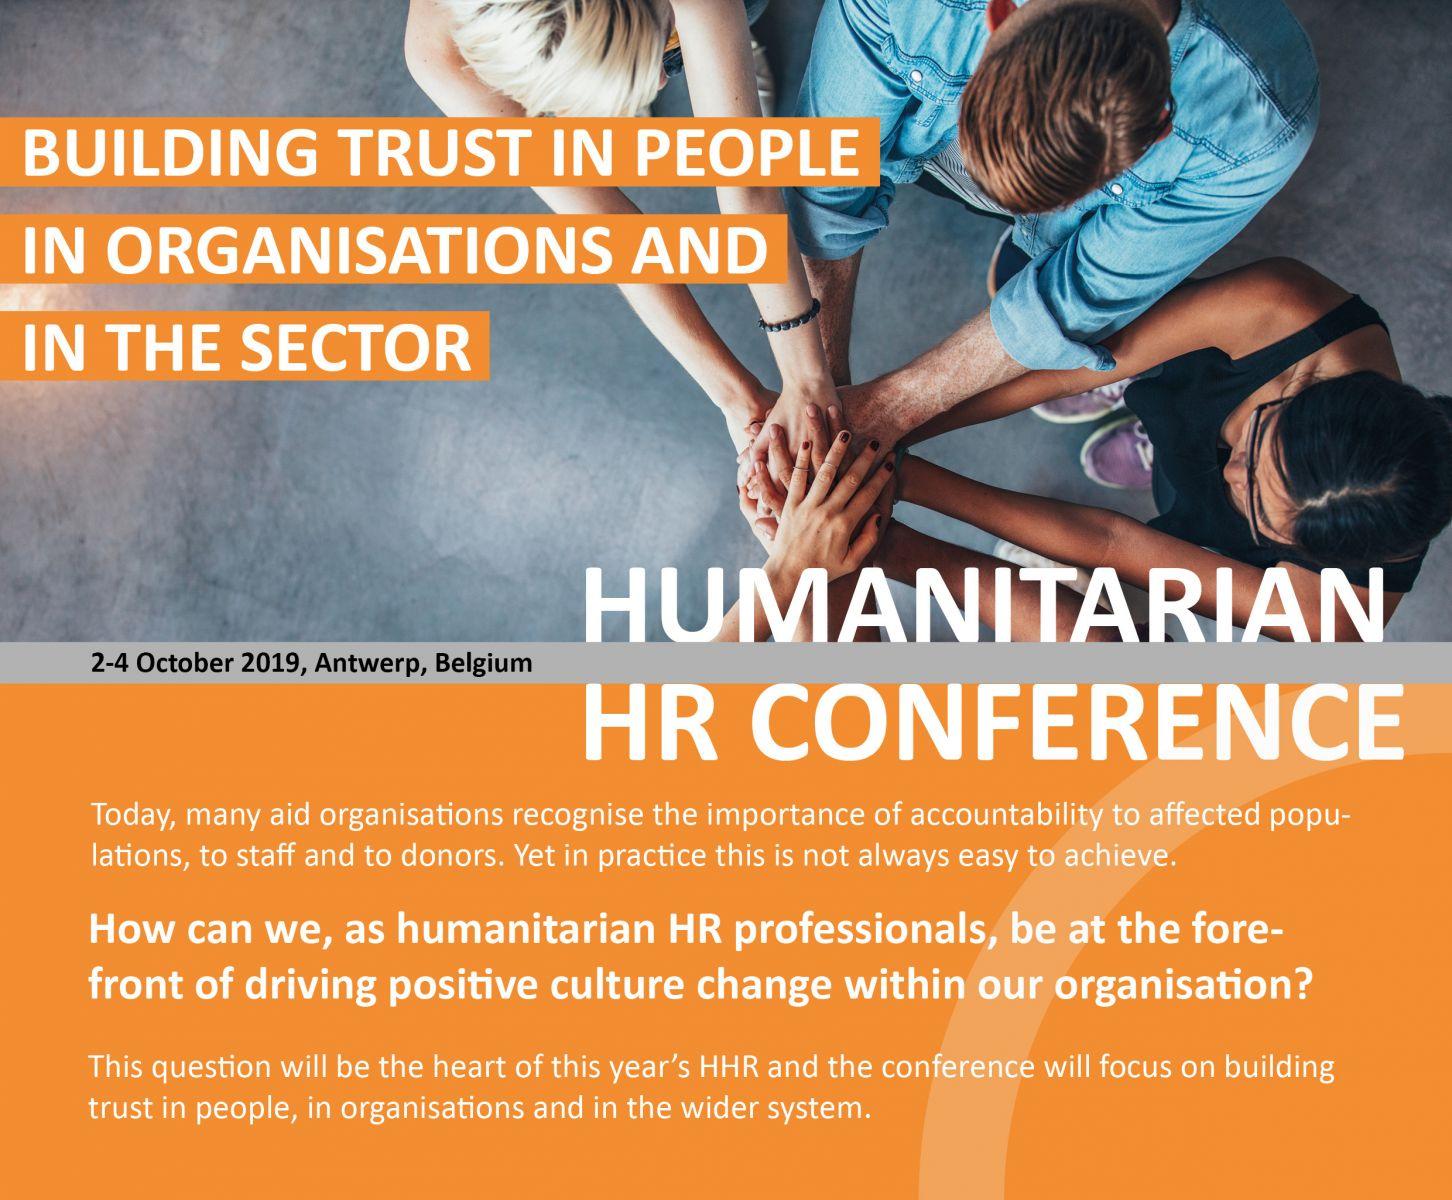 Humanitarian HR